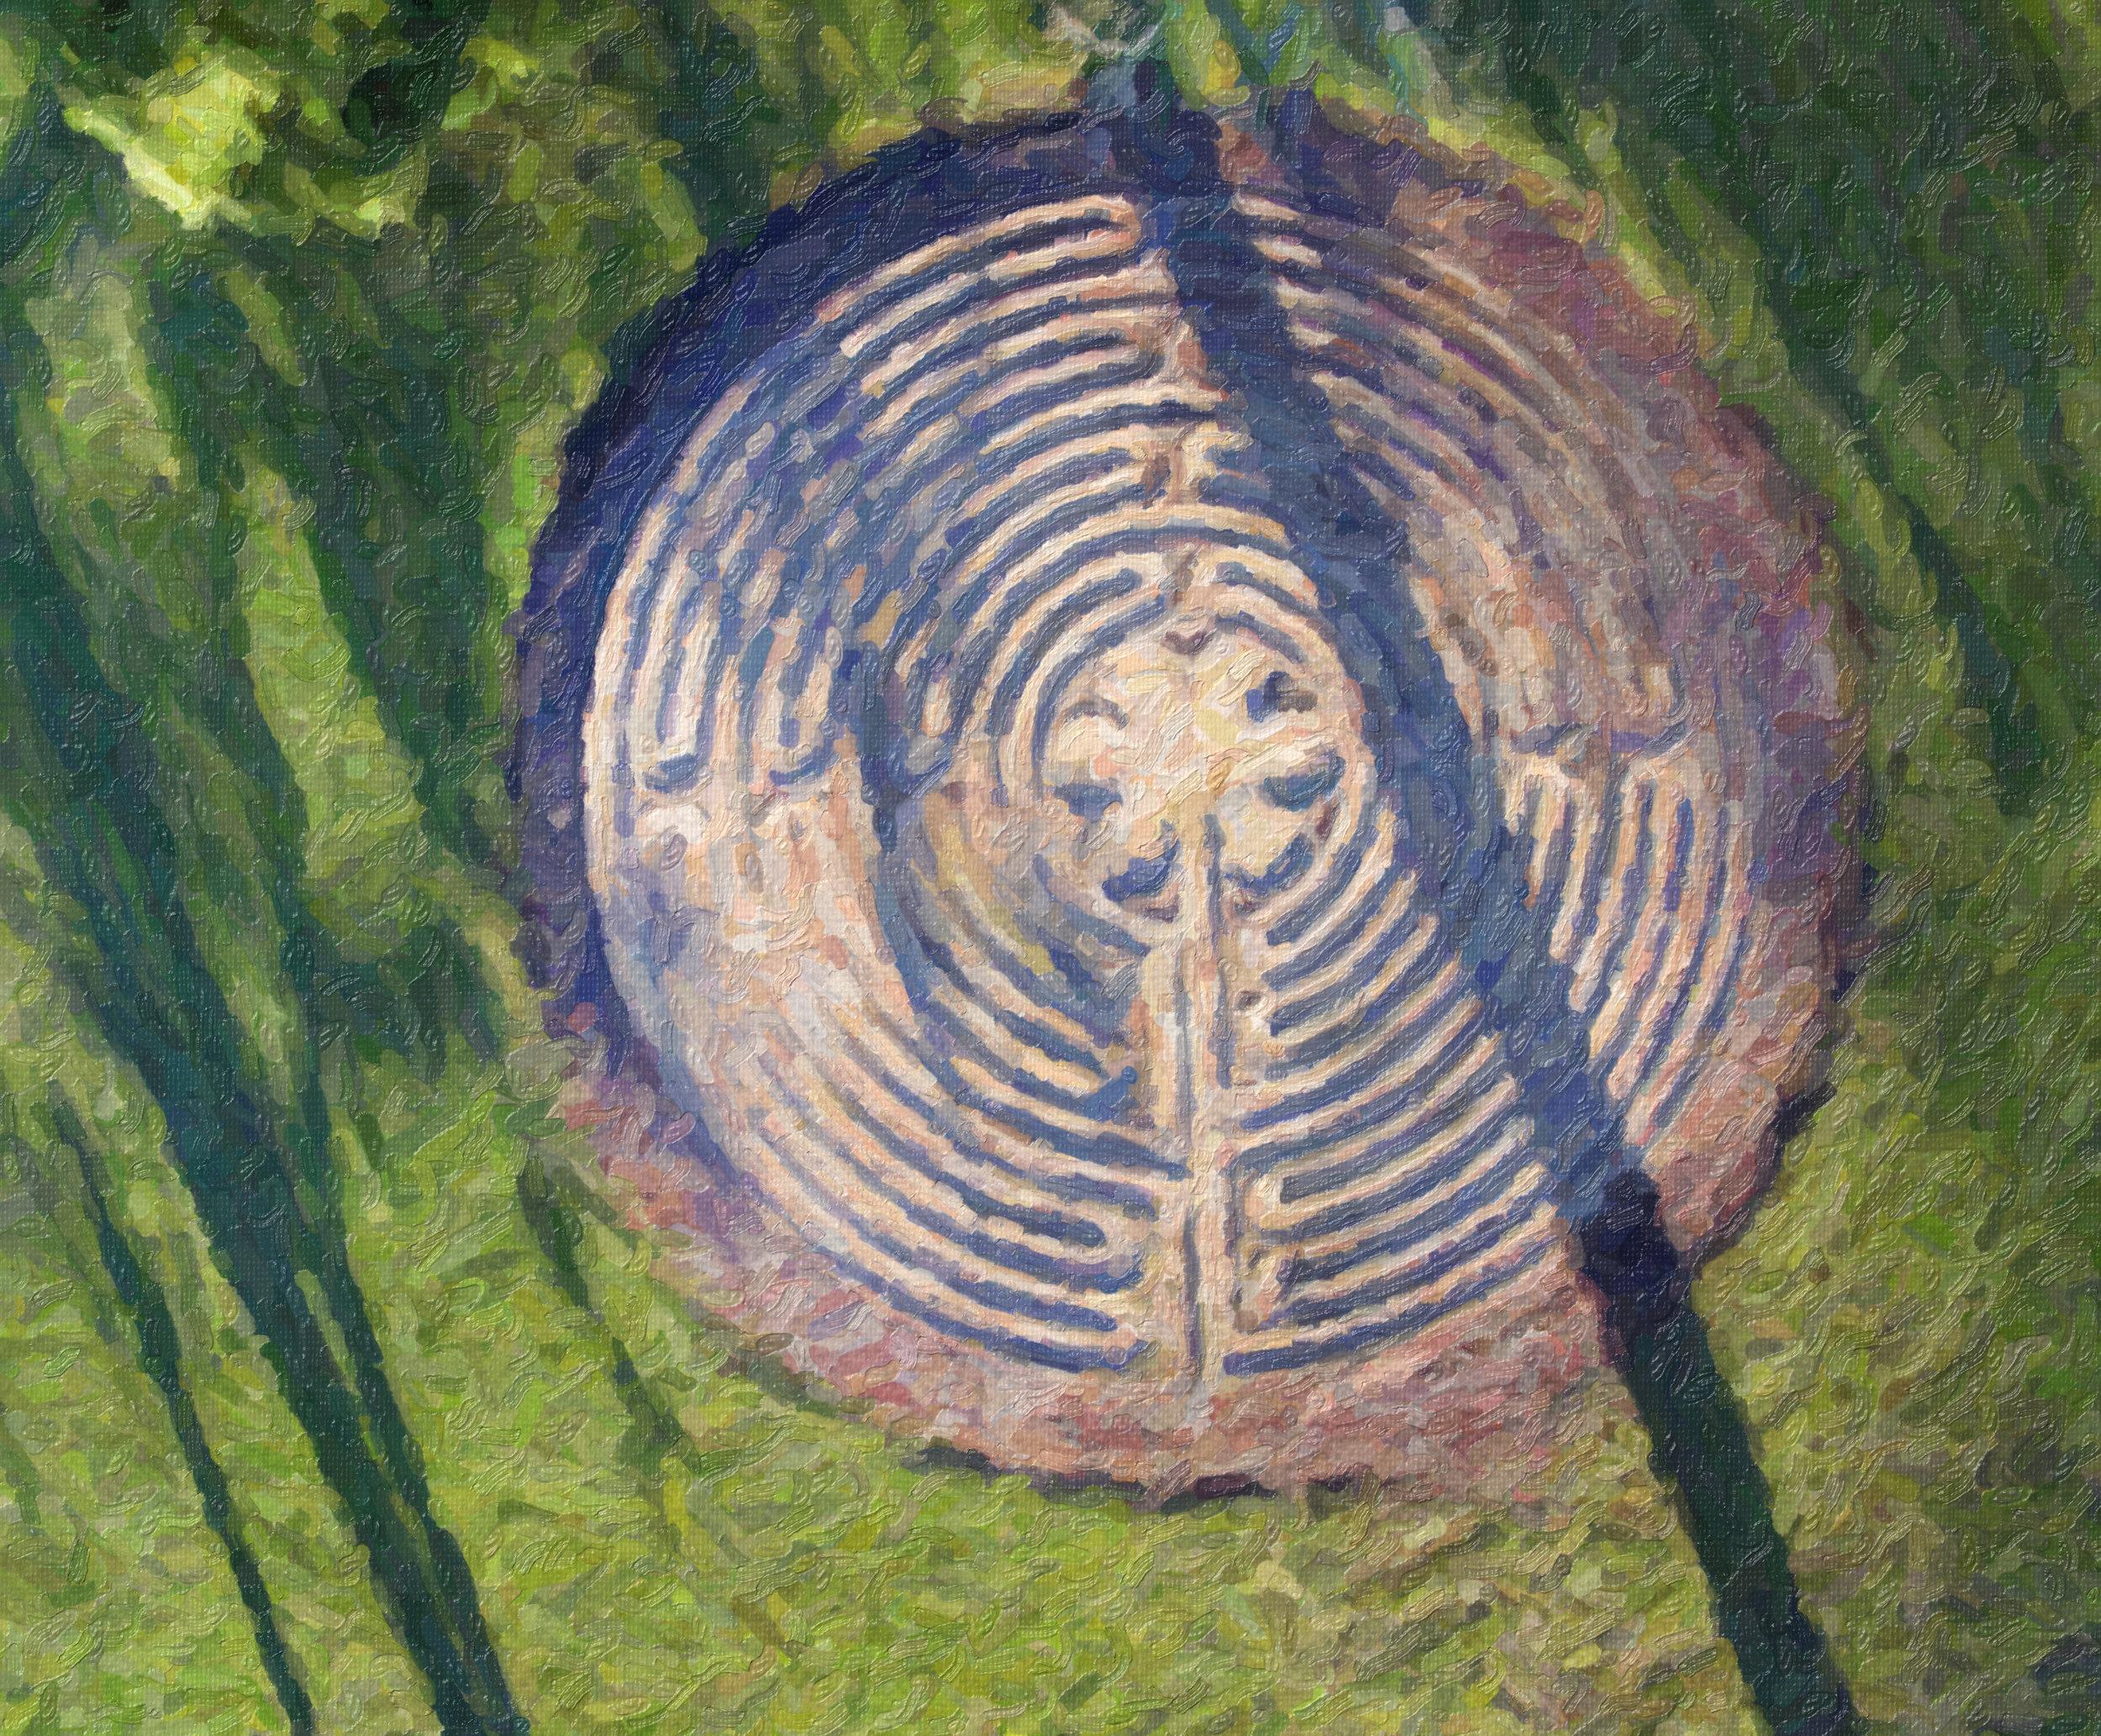 drone labyrinth shadows photo into art.jpg